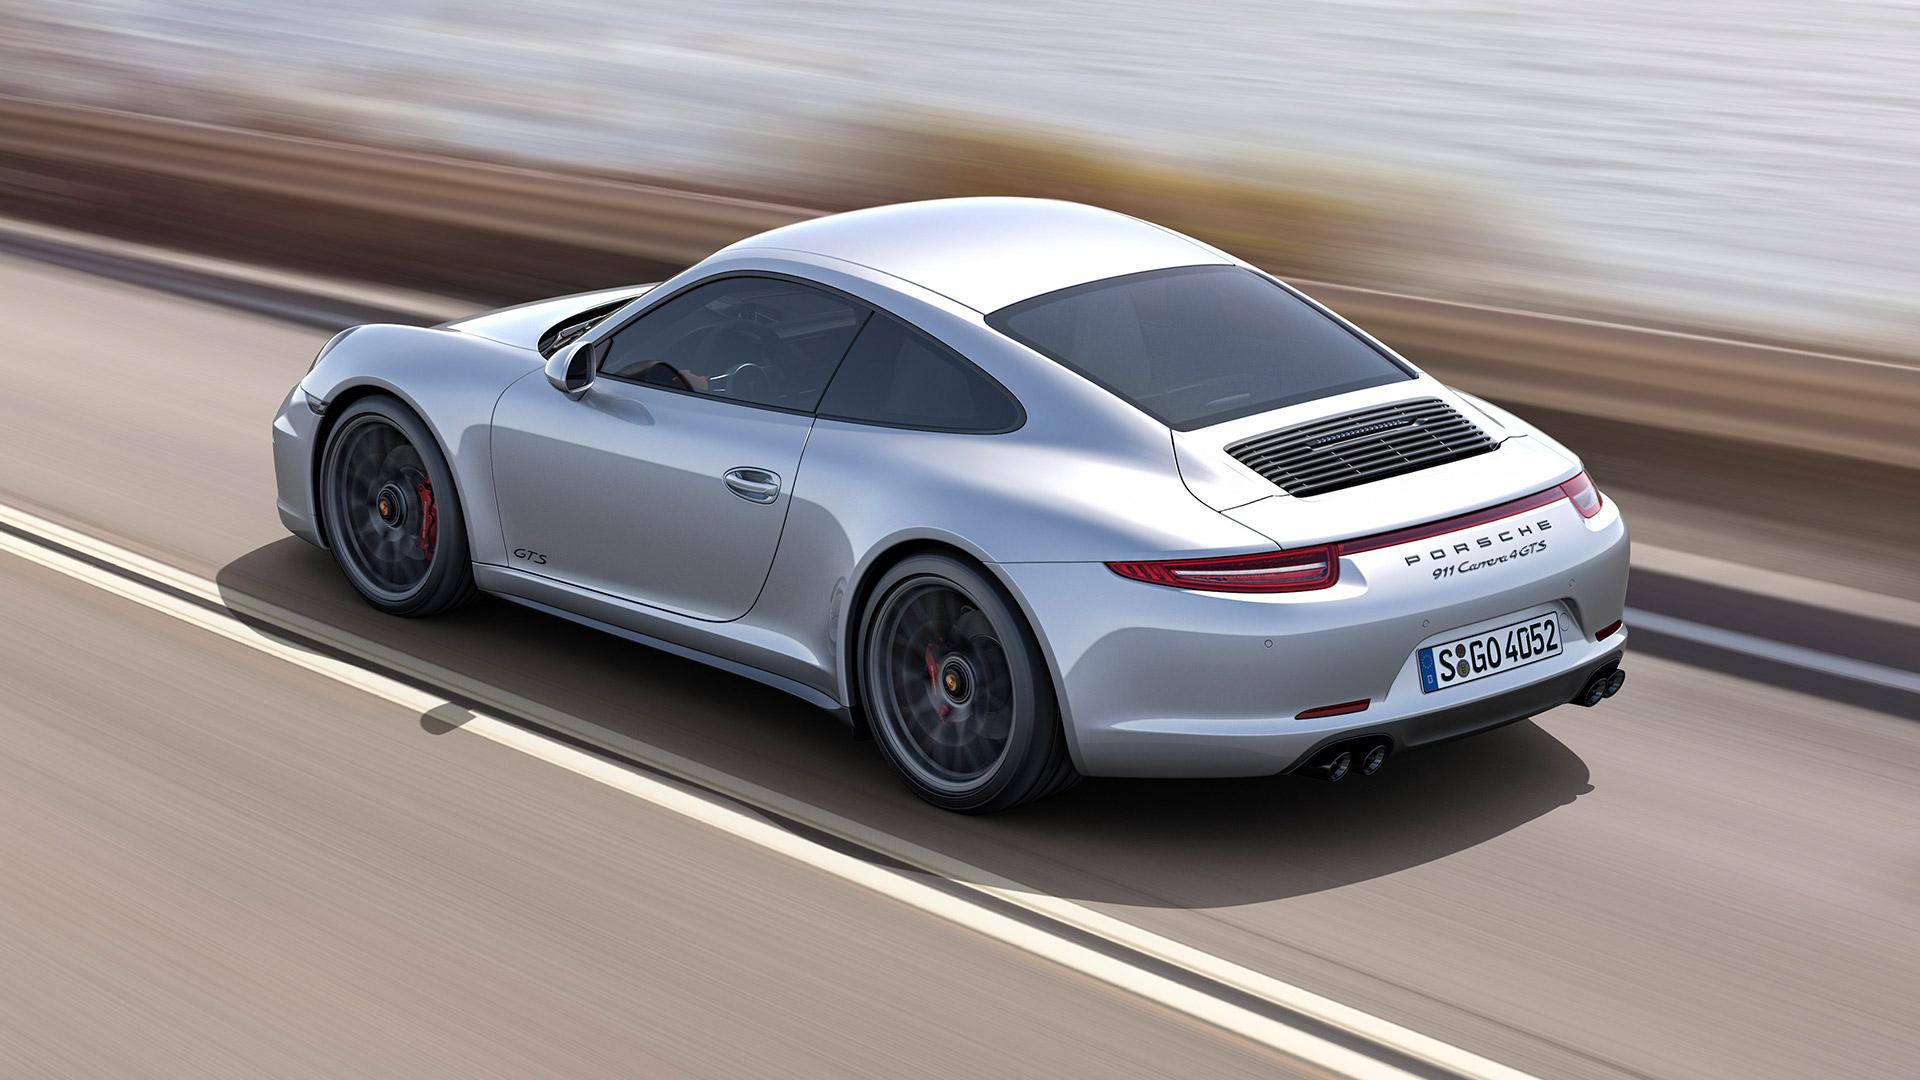 Porsche 911 2015 Carrera 4 GTS Exterior